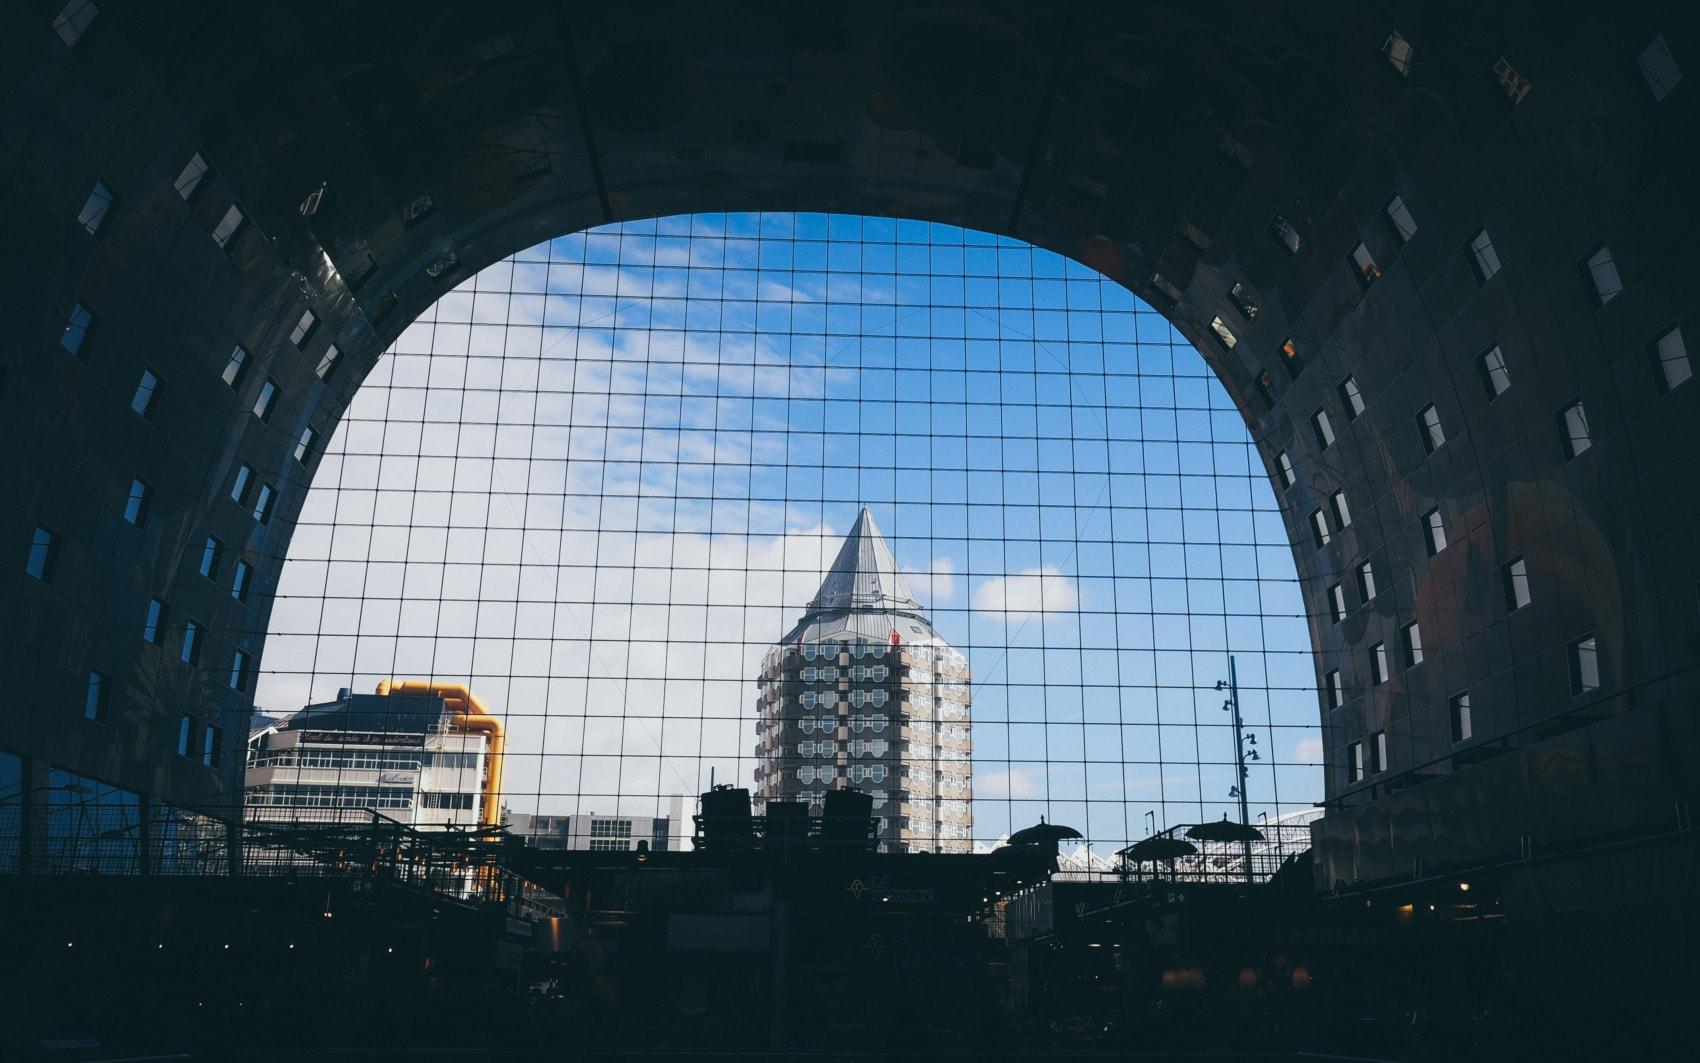 marché couvert Rotterdam